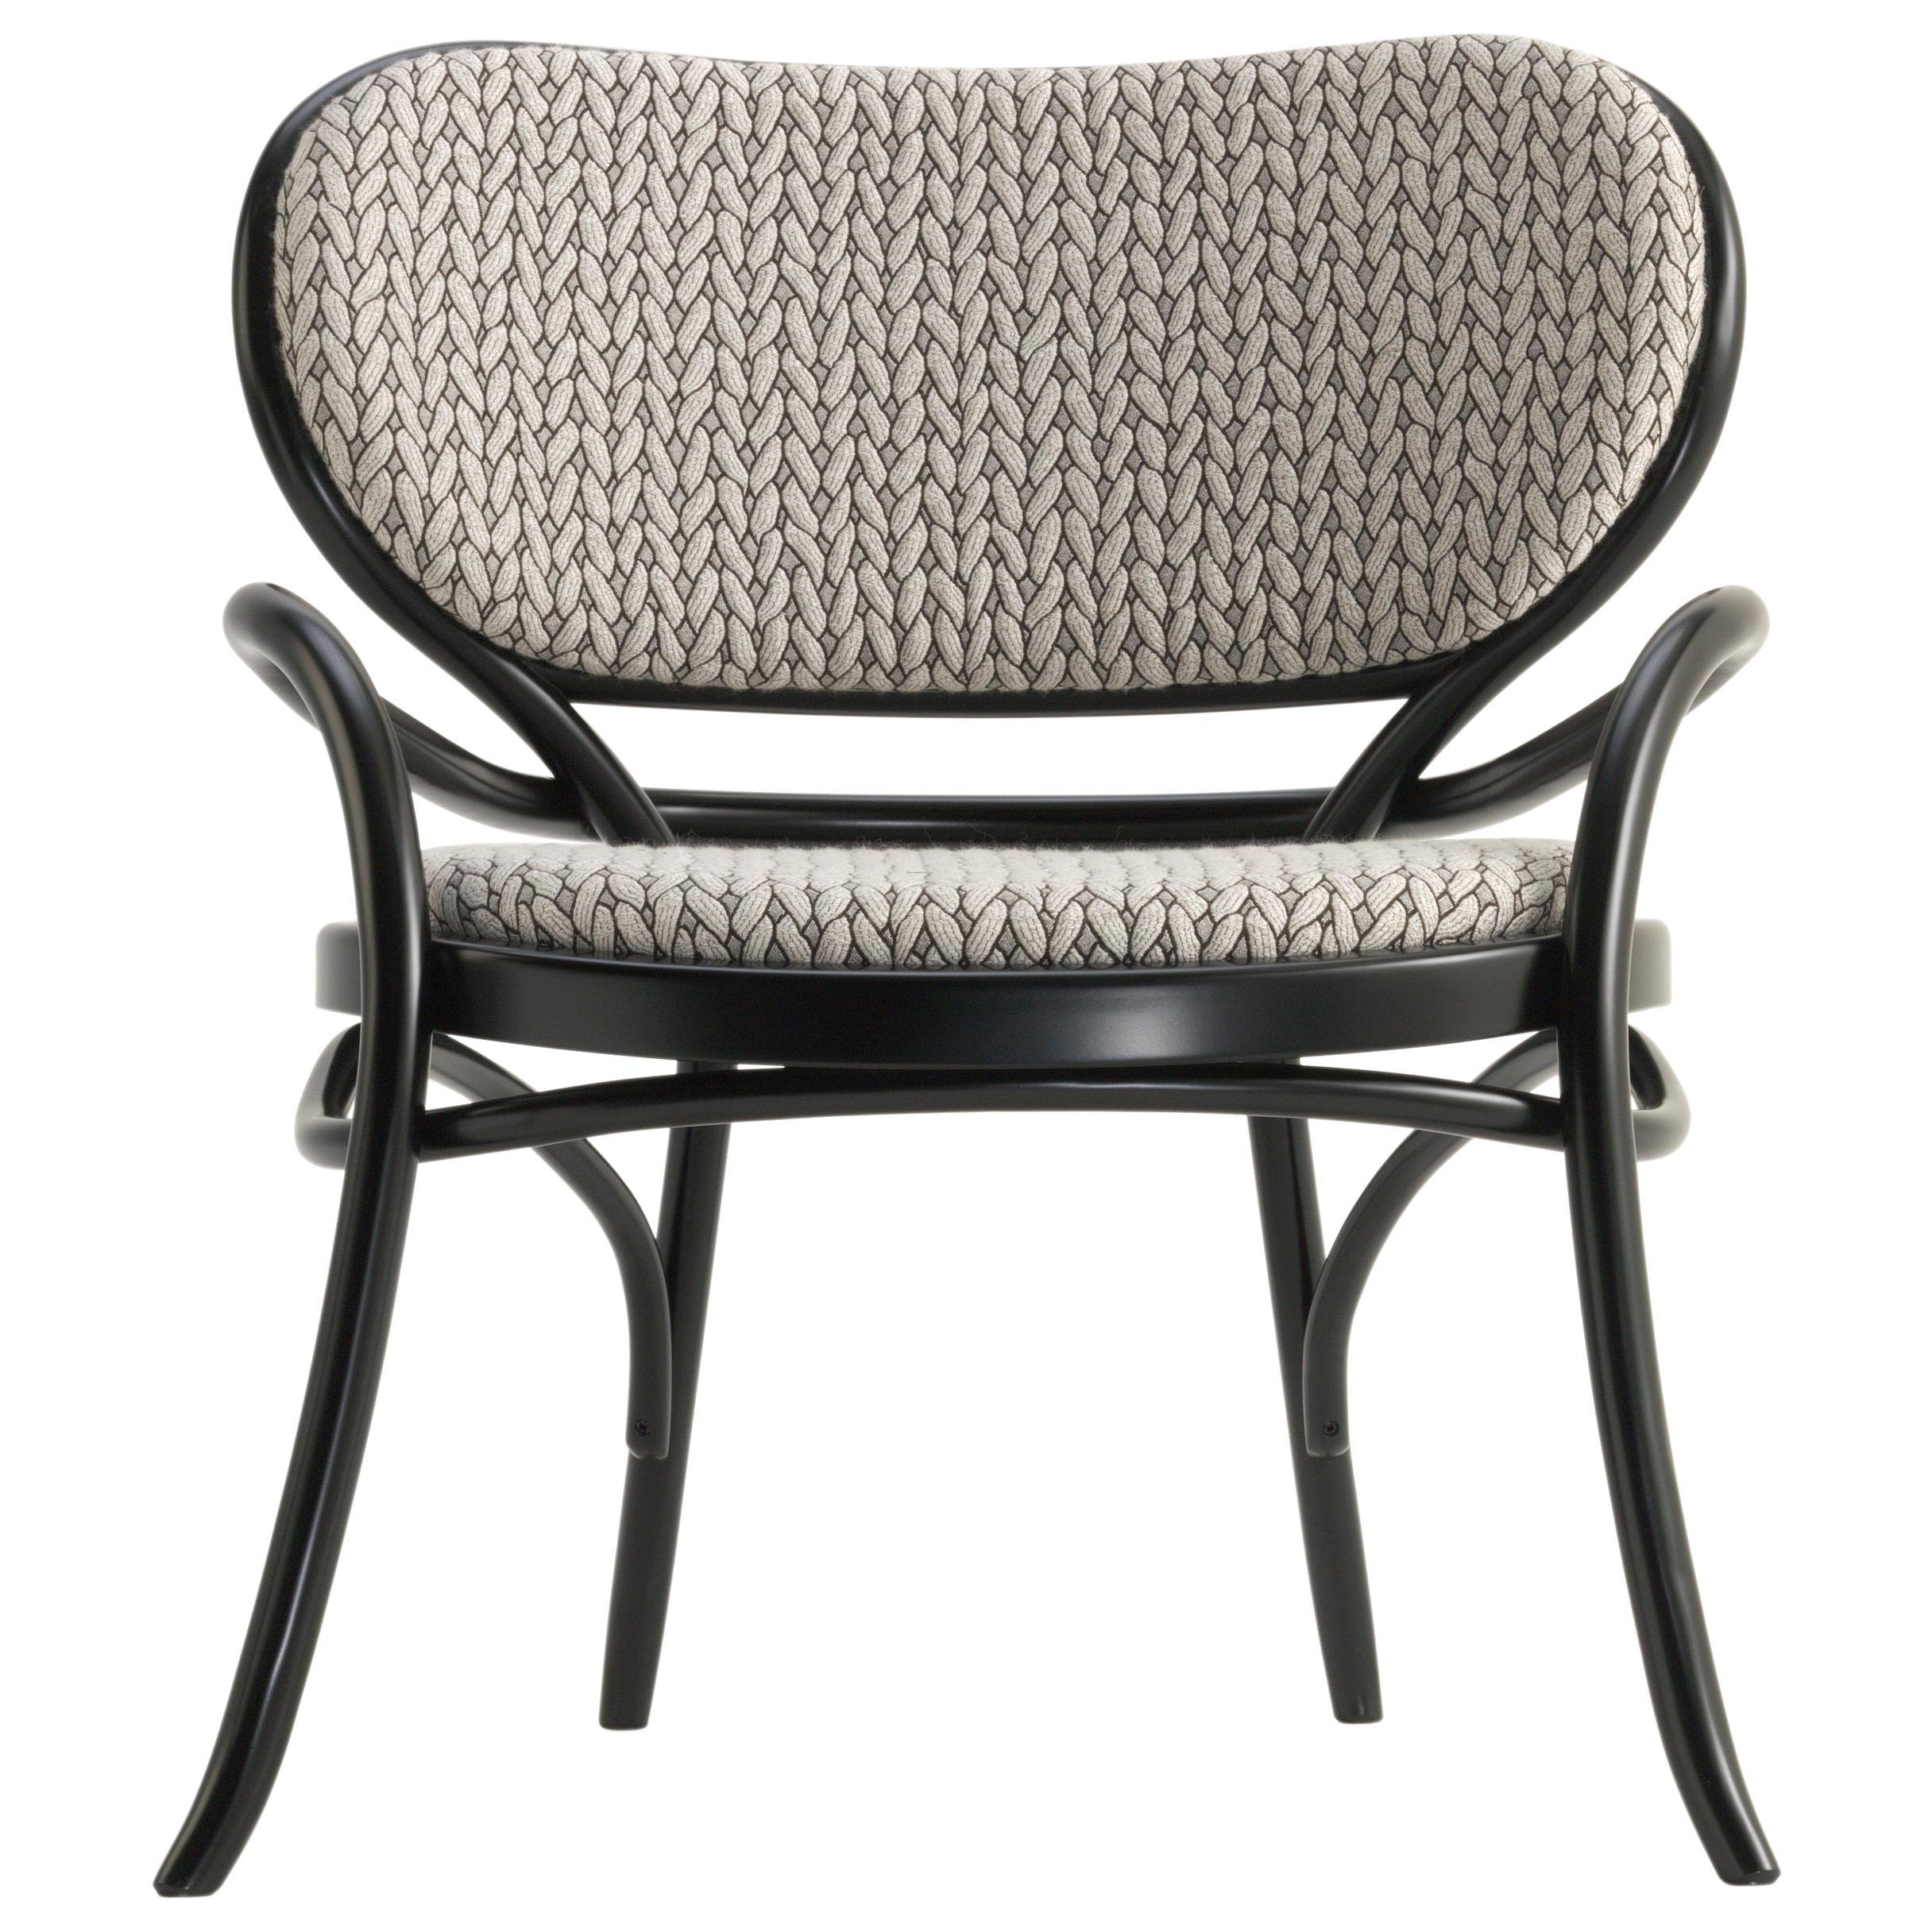 Gebrüder Thonet Vienna GmbH Lehnstuhl Lounge Chair with Upholstered Seat